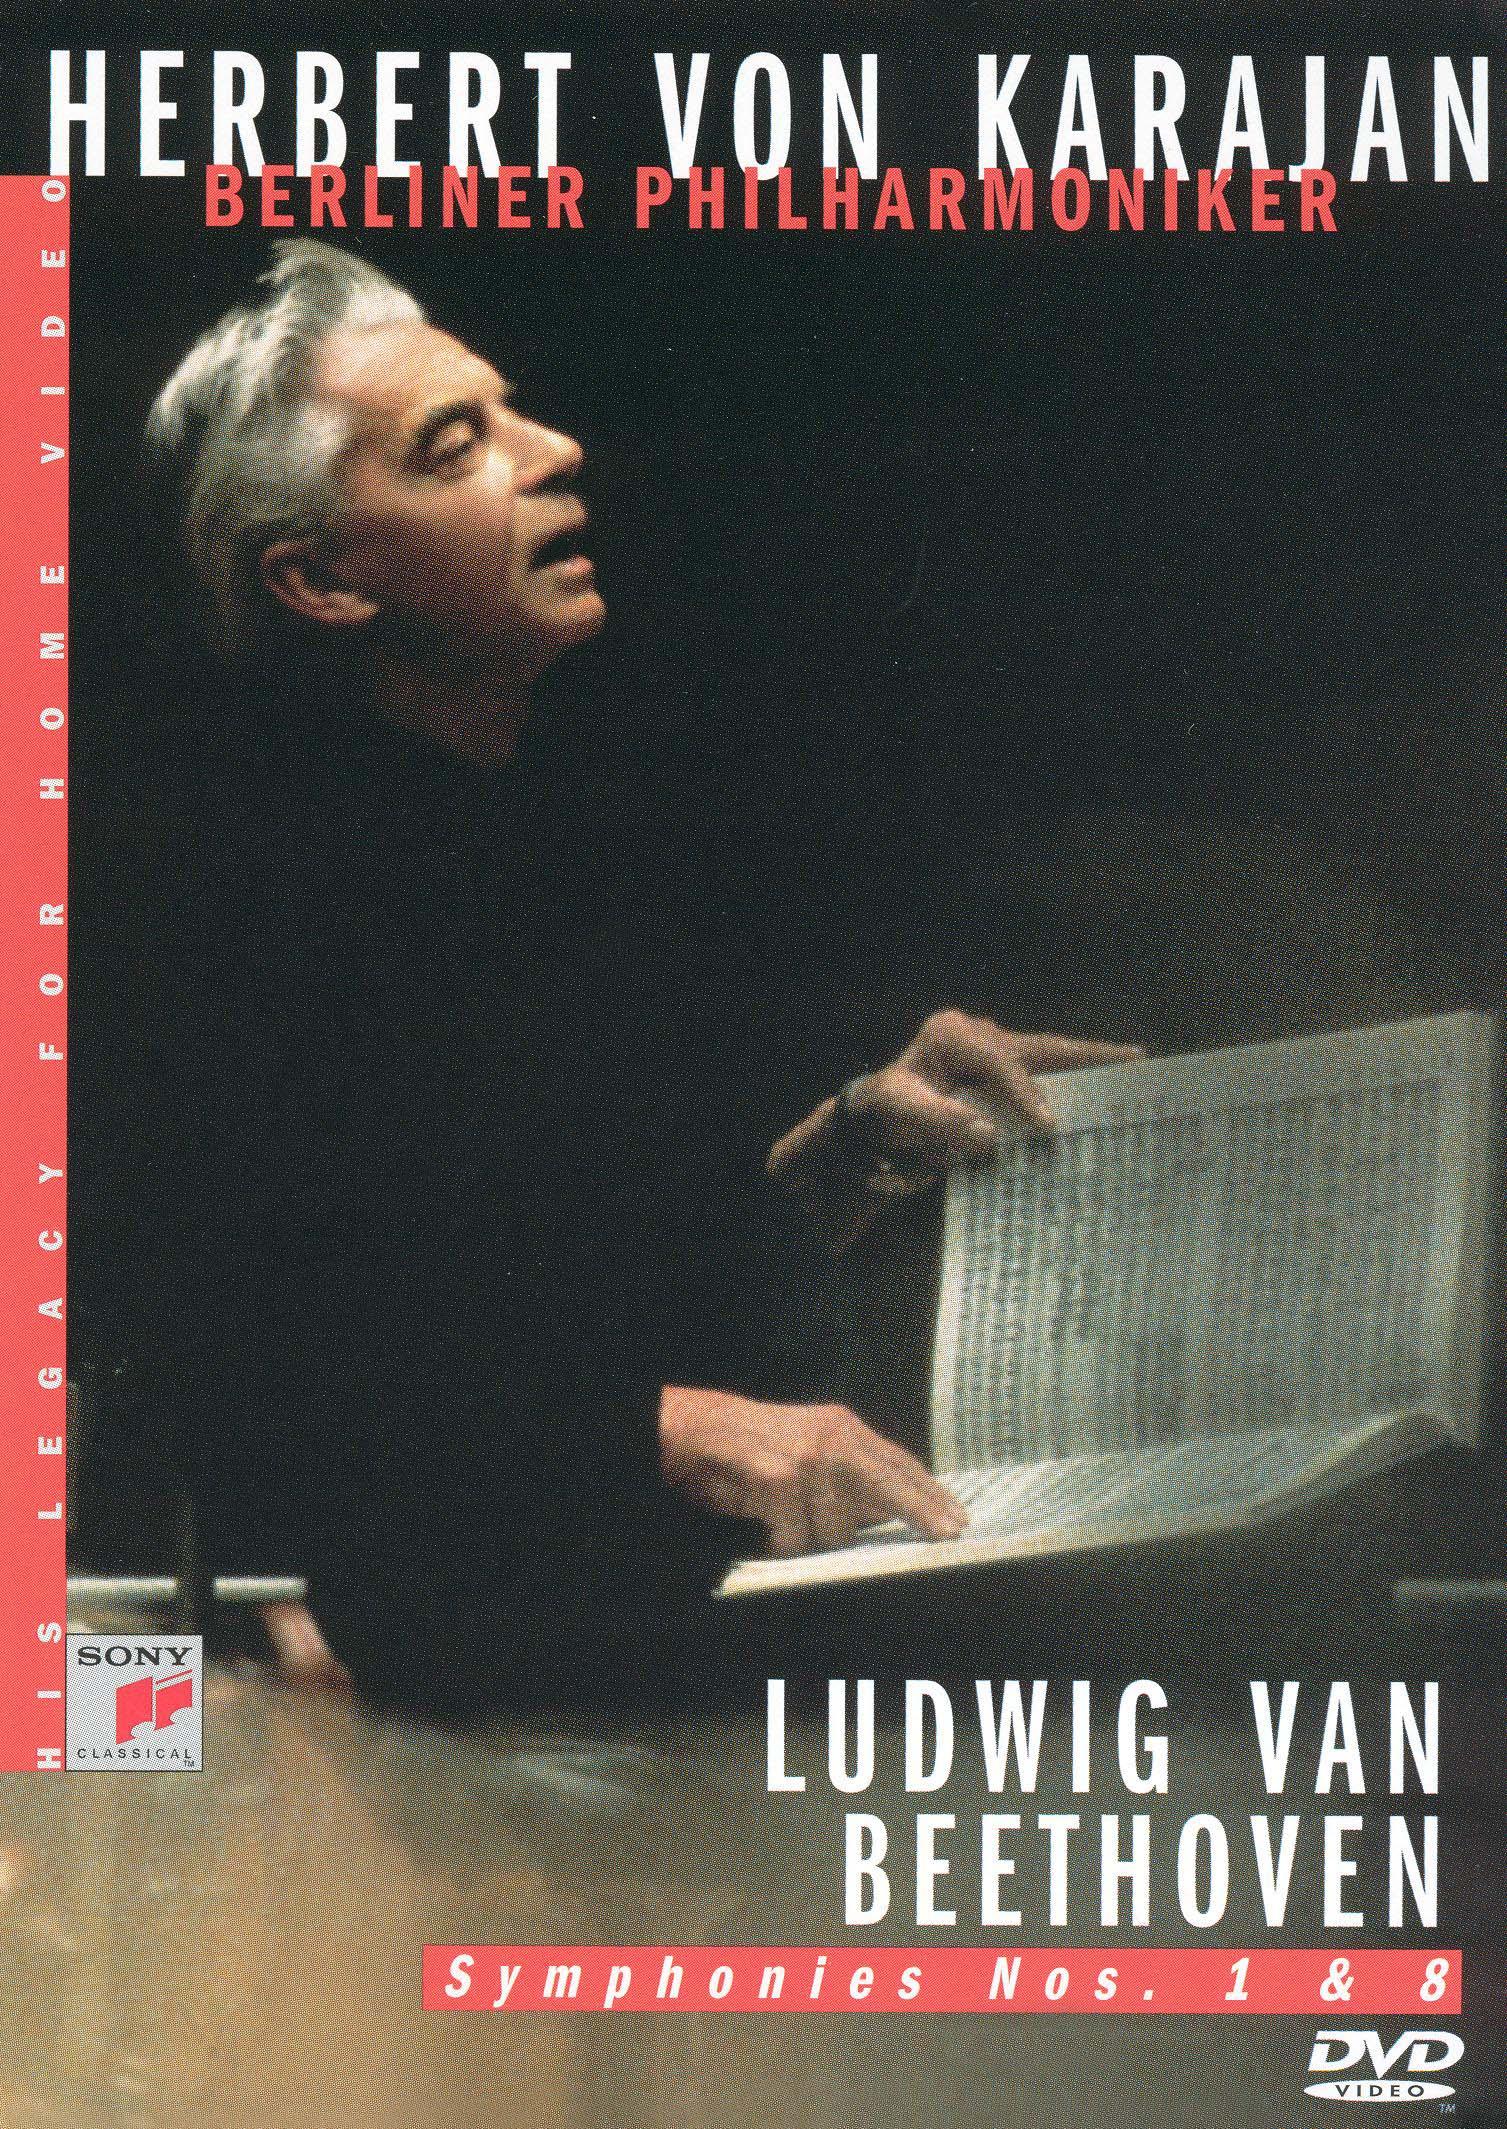 Herbert Von Karajan - His Legacy for Home Video: Beethoven Symphonies Nos. 1 & 8